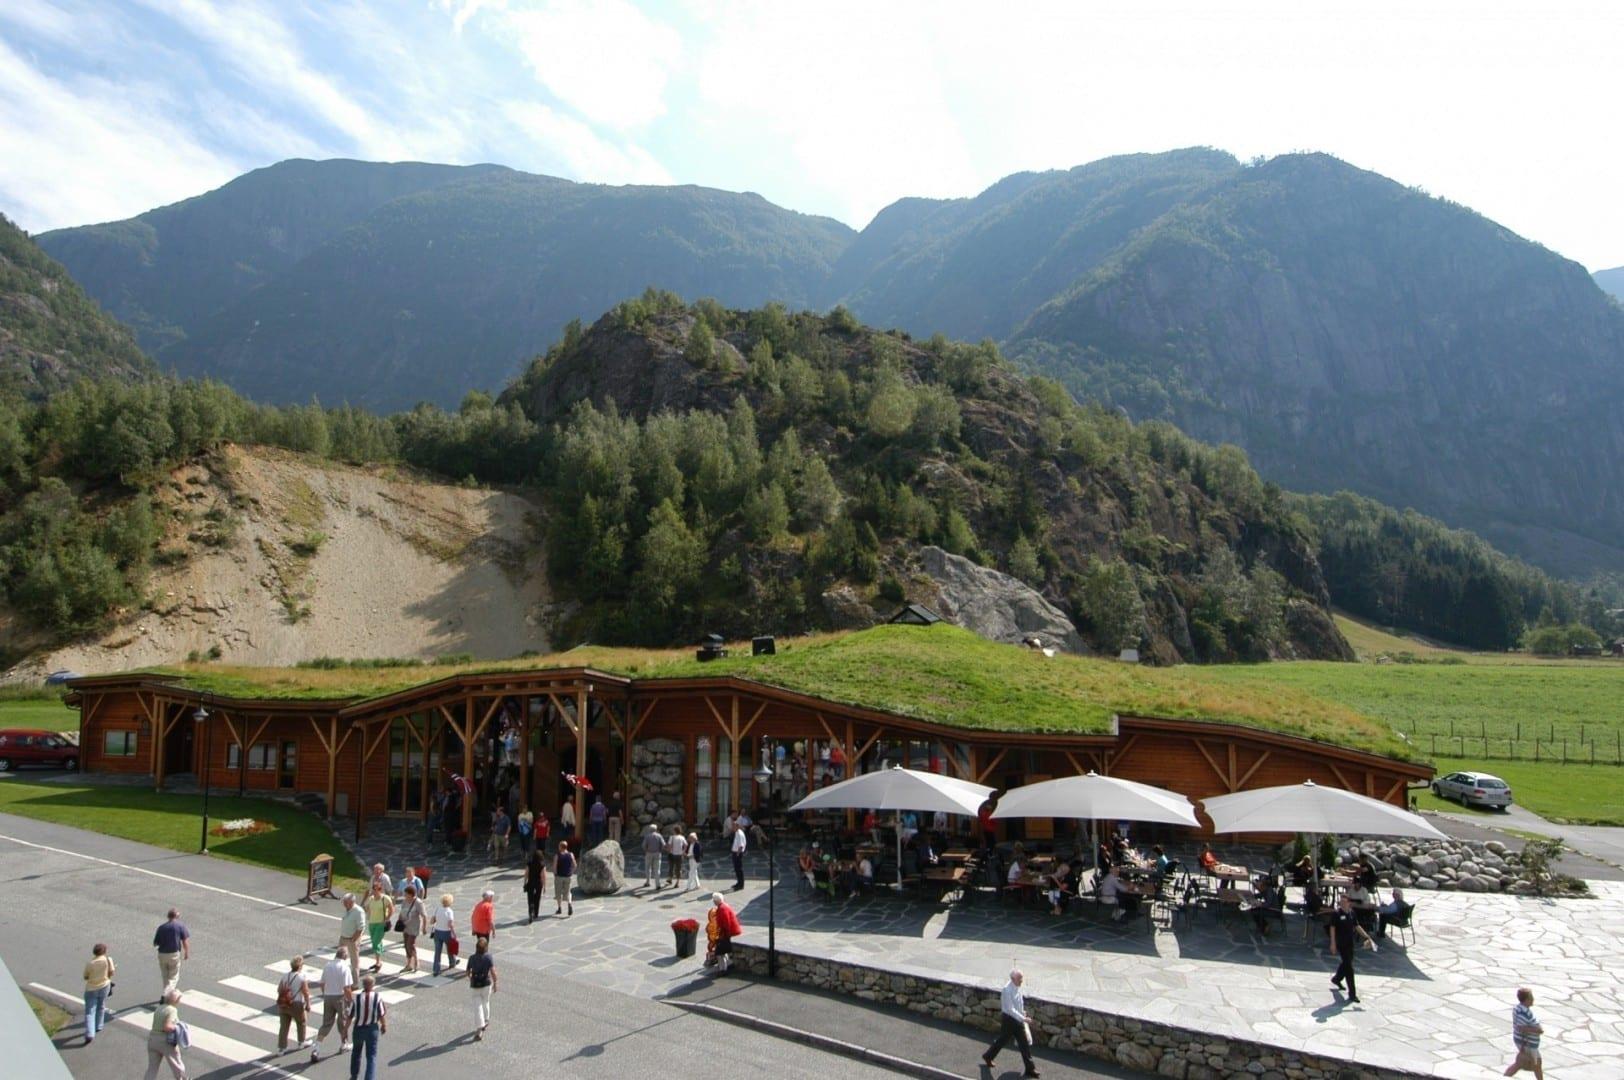 Hardangerviddahallen Restaurante y Café Eidfjord Noruega